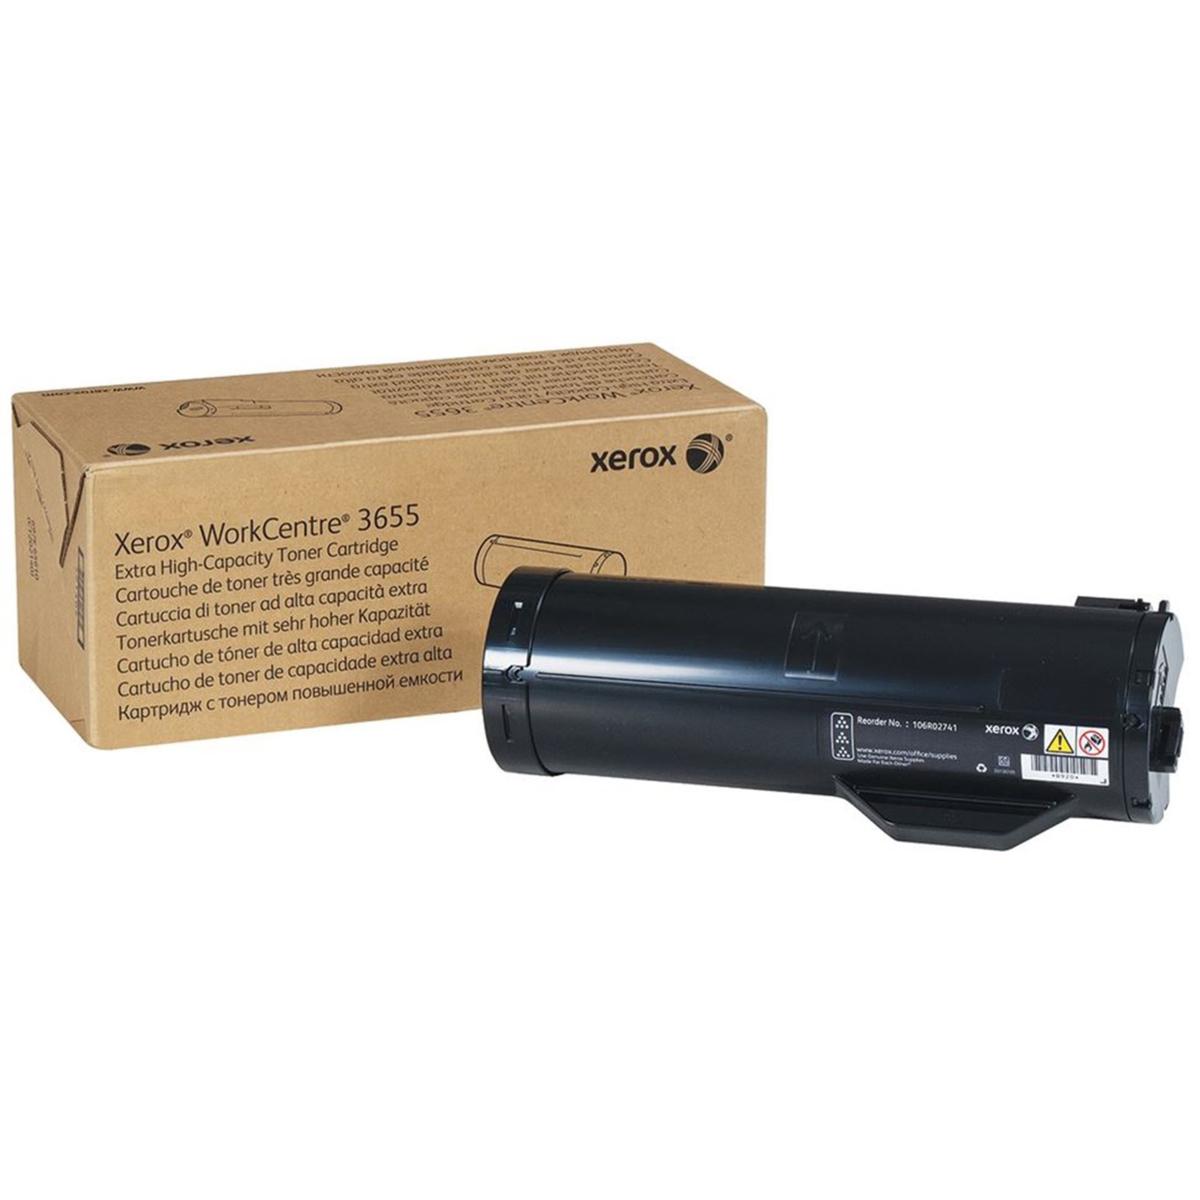 Xerox originální toner 106R02741, black, 25900str., Xerox Workcentre 3655